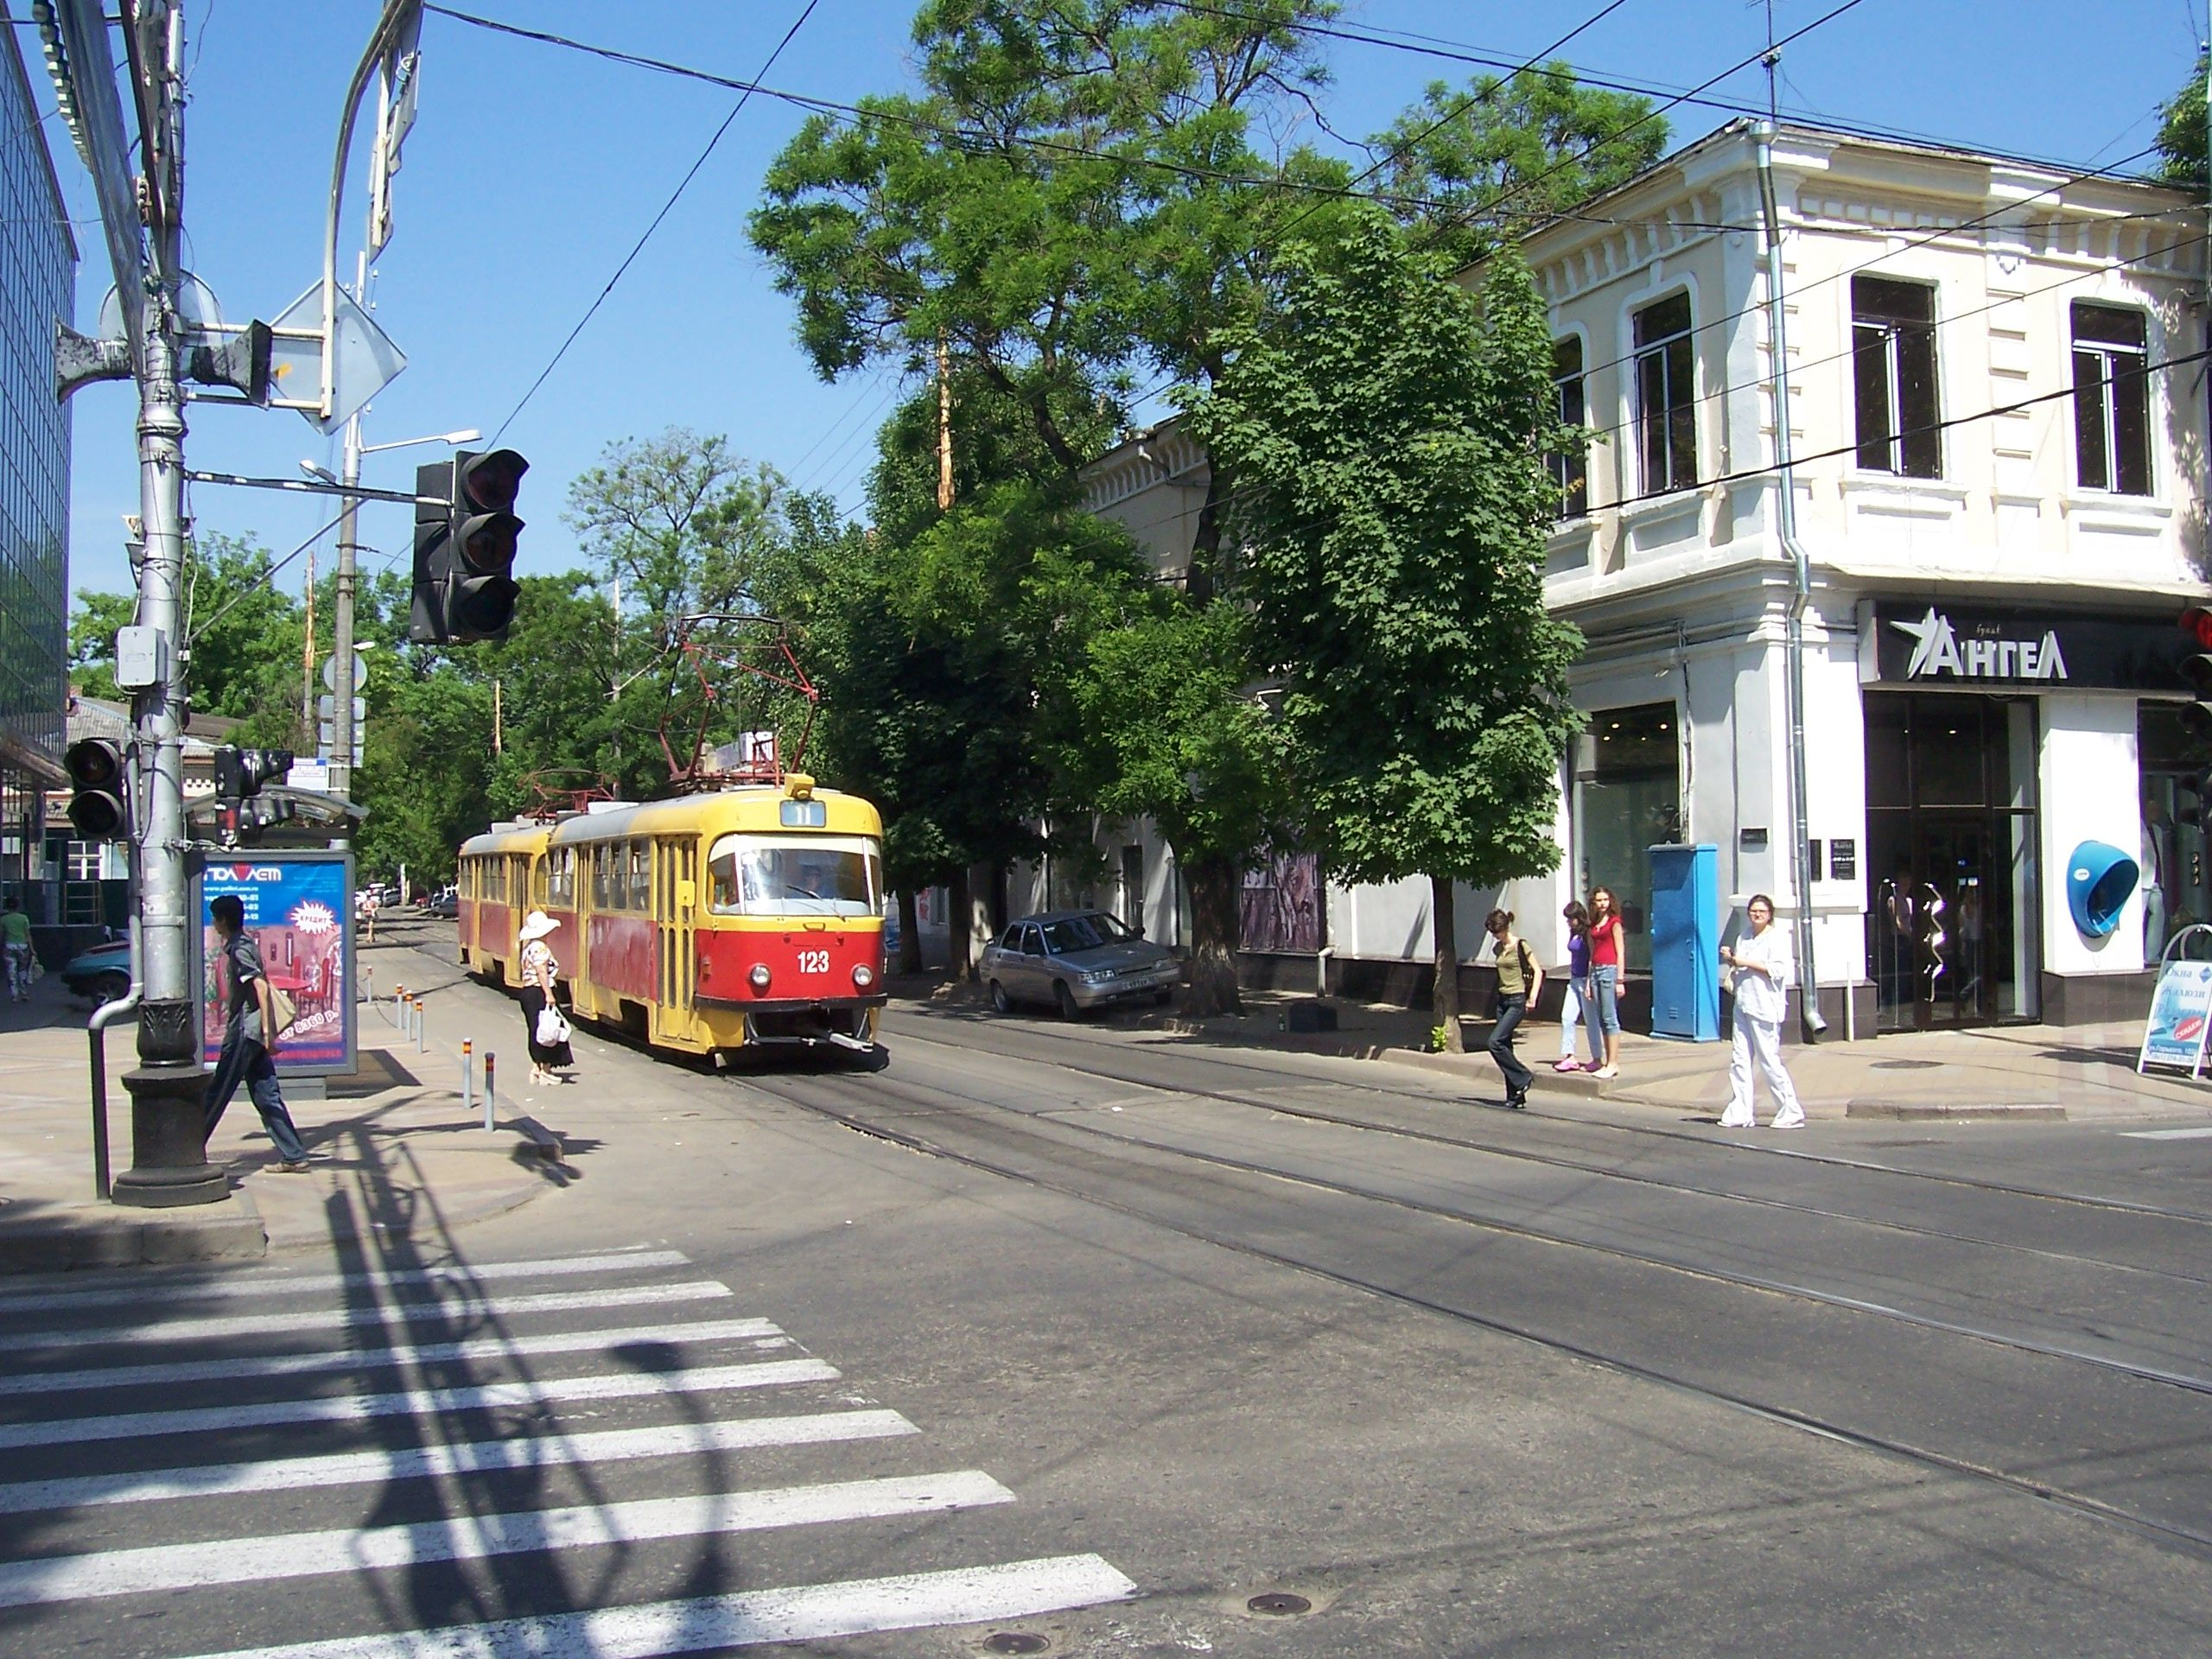 Krasnodar Krasnodar Street View Street